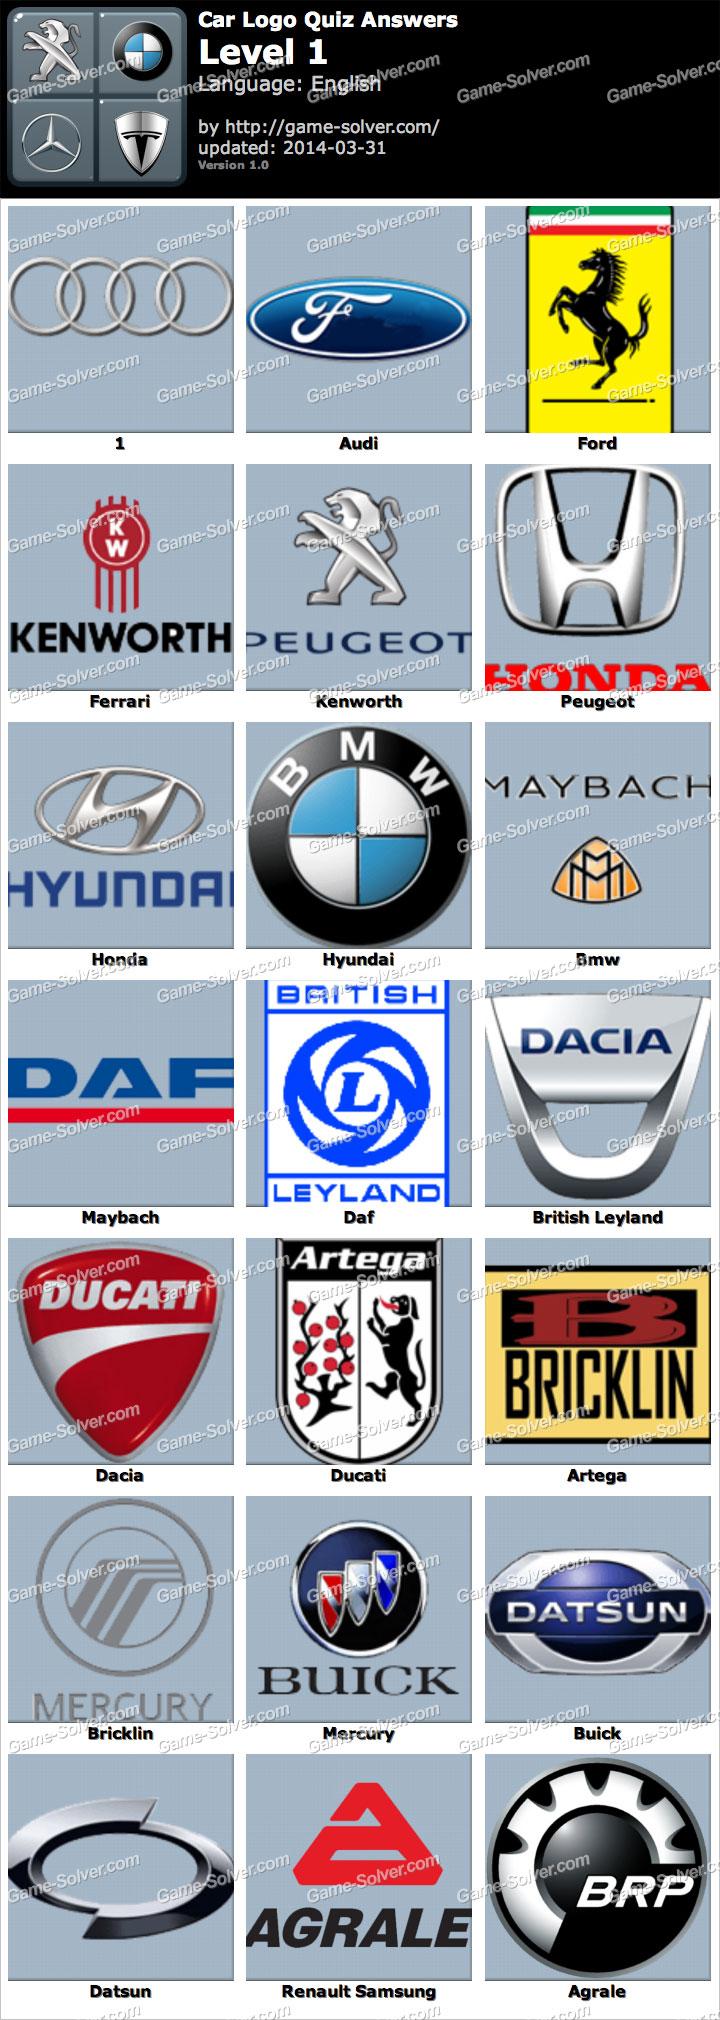 Car Logo Quiz Level 1